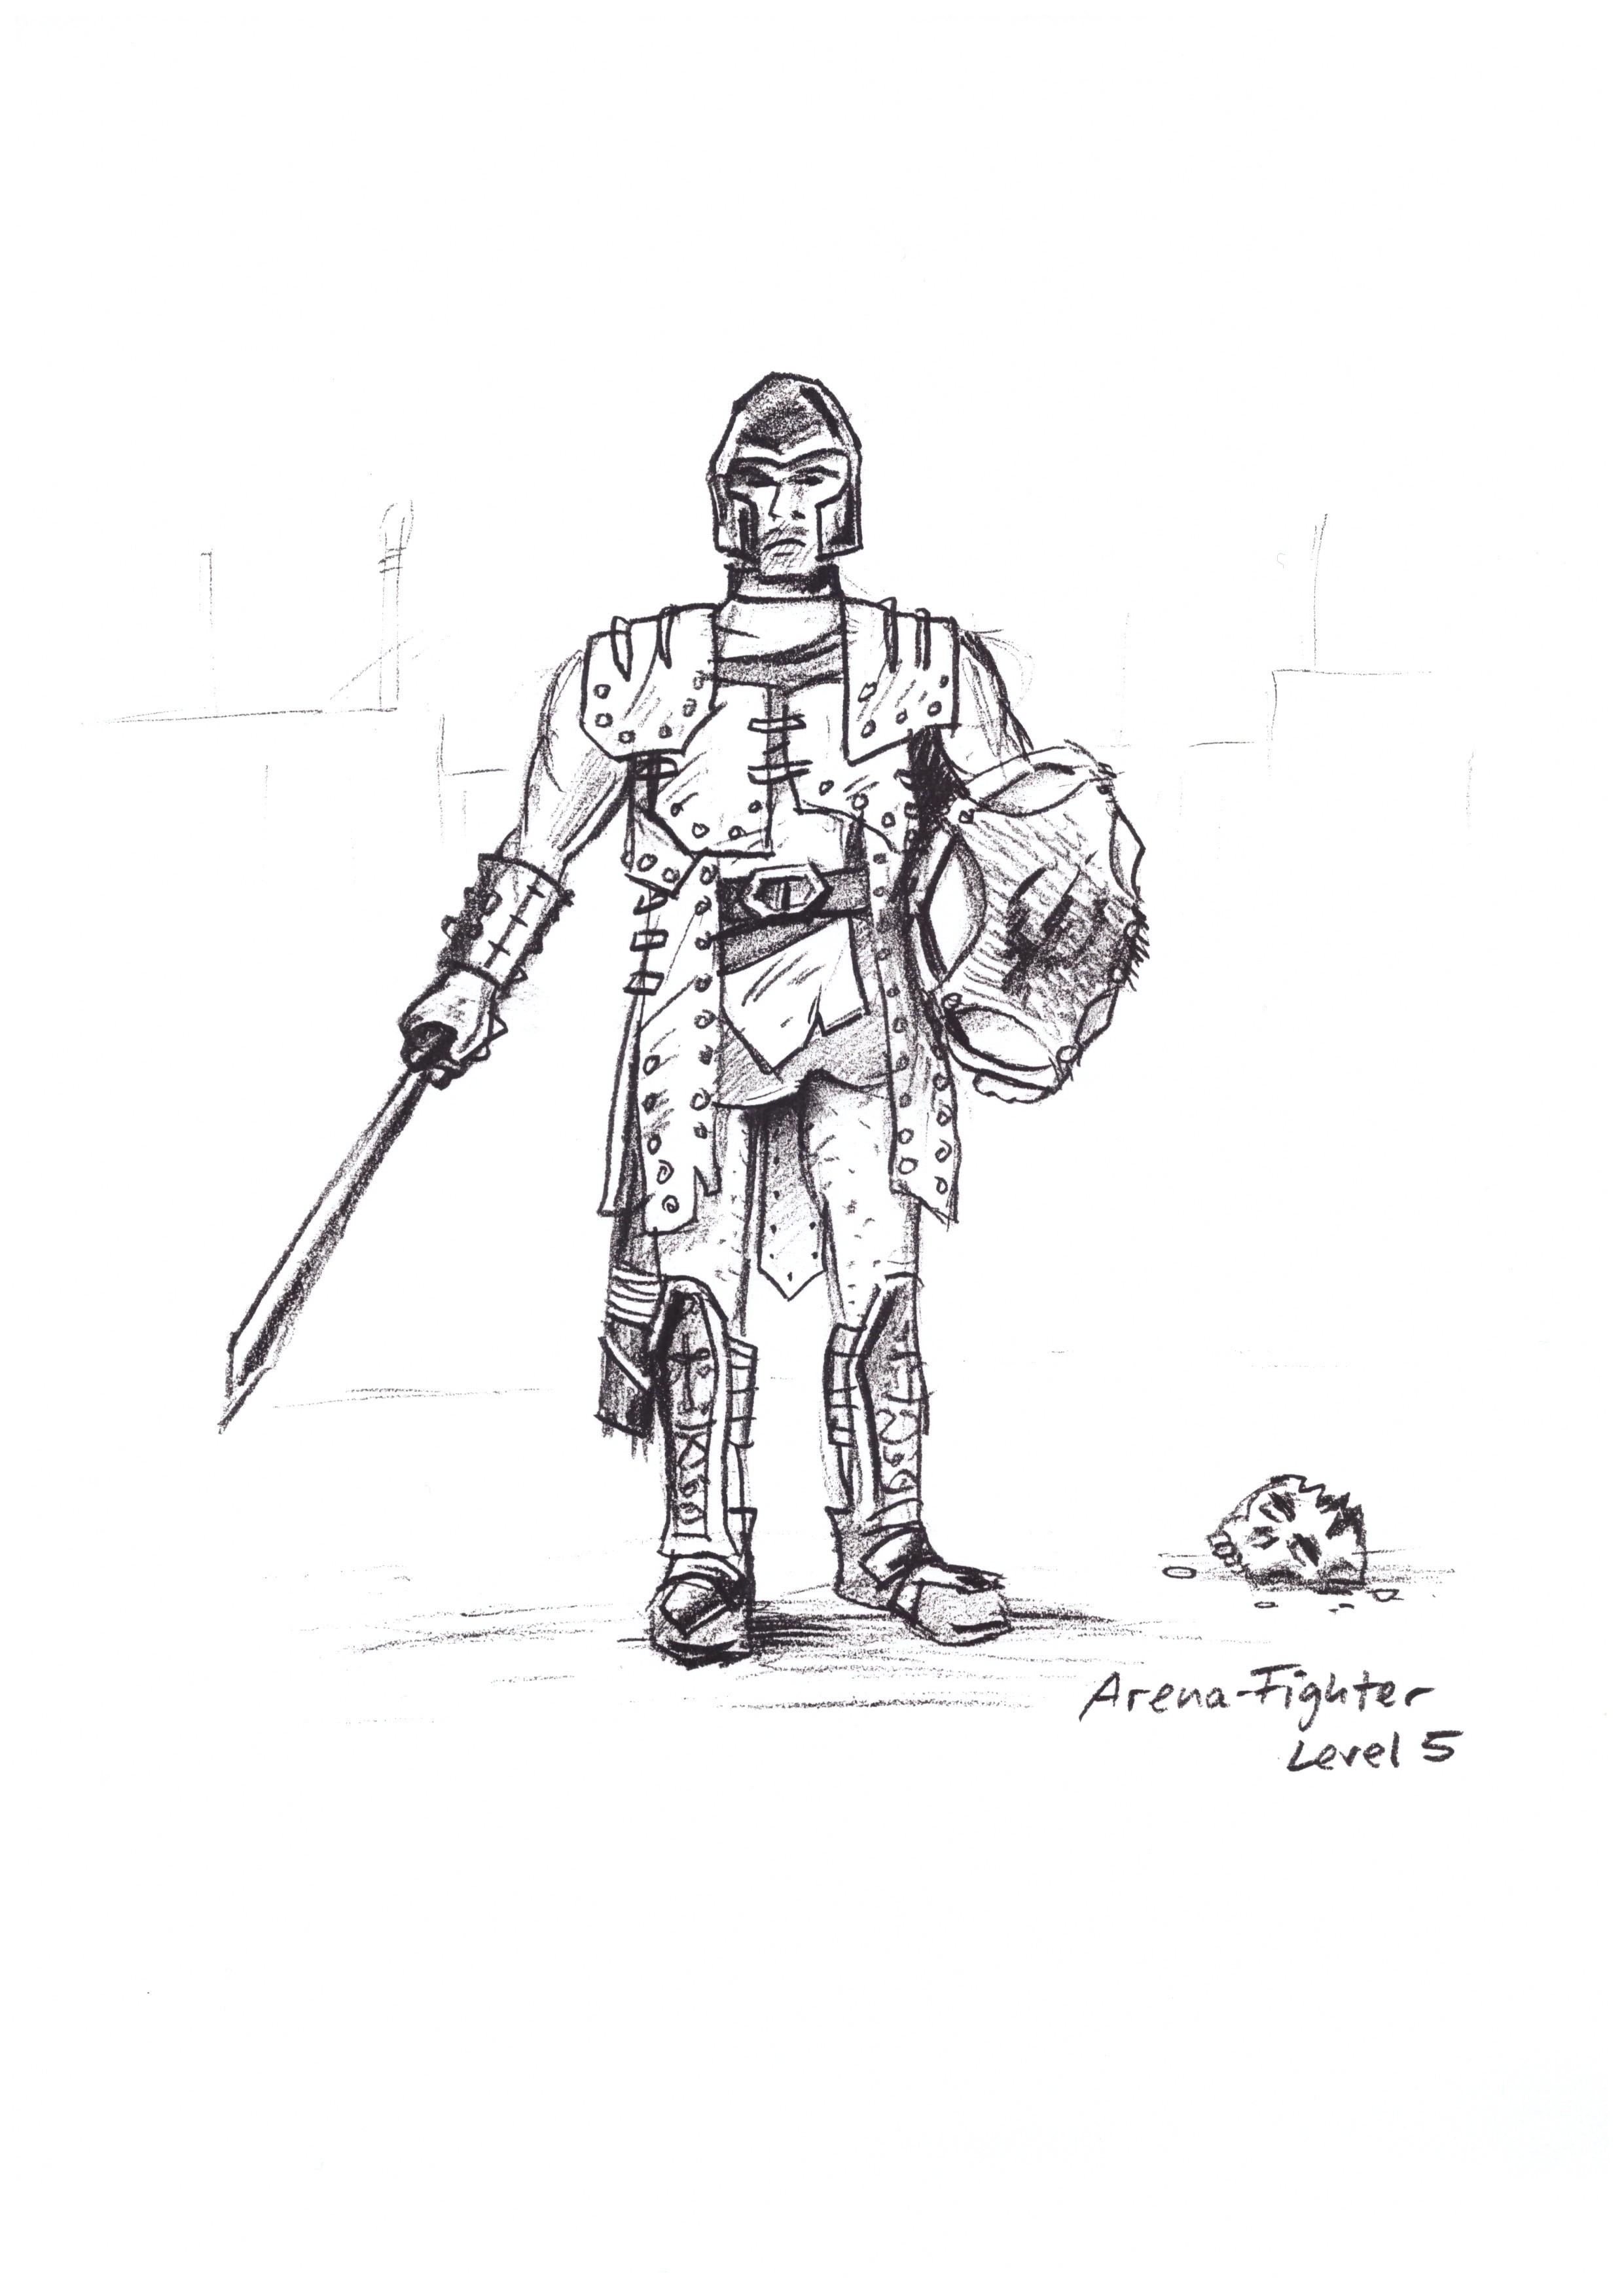 Arenafighter Sketch